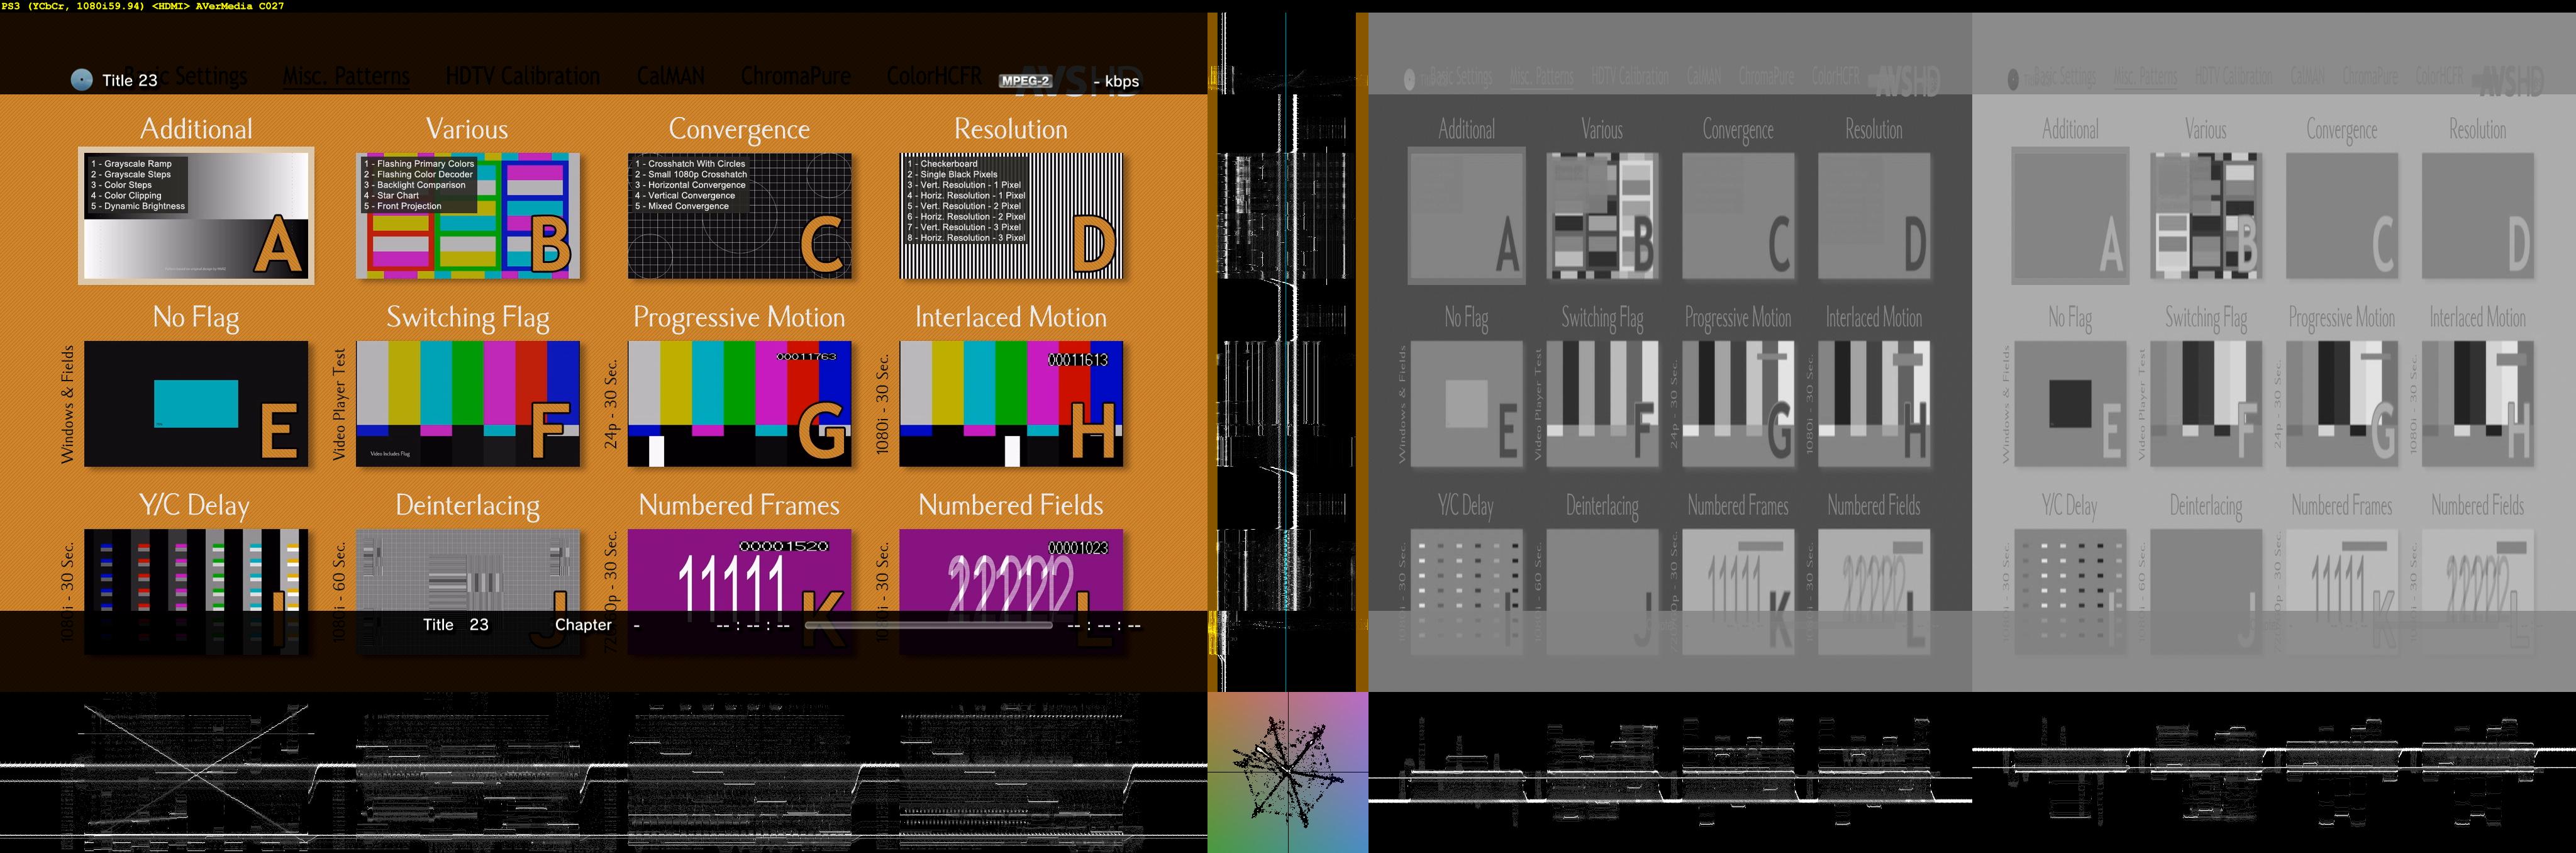 Click image for larger version  Name:AVS HD 709 BD menu - PS3, YCbCr =HDMI= AVerMedia C027.png Views:3034 Size:3.41 MB ID:35270